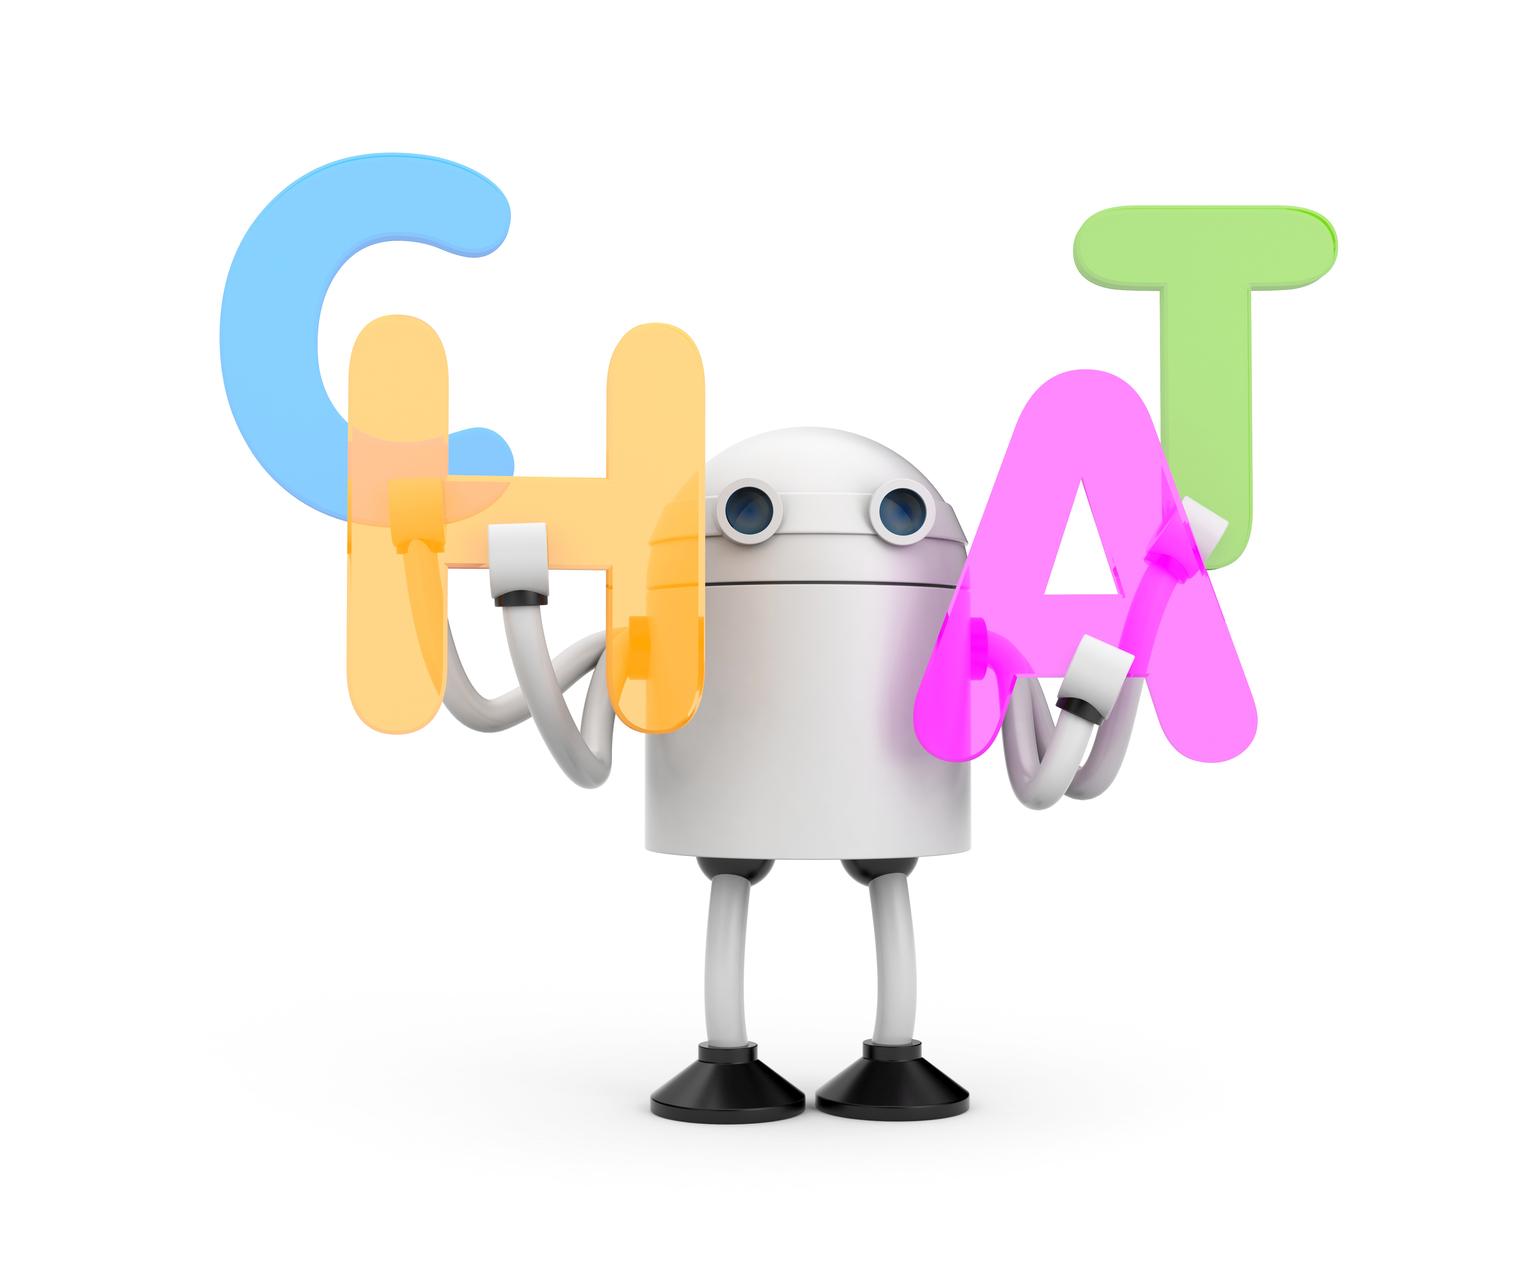 Can chatbots meet human expectations?